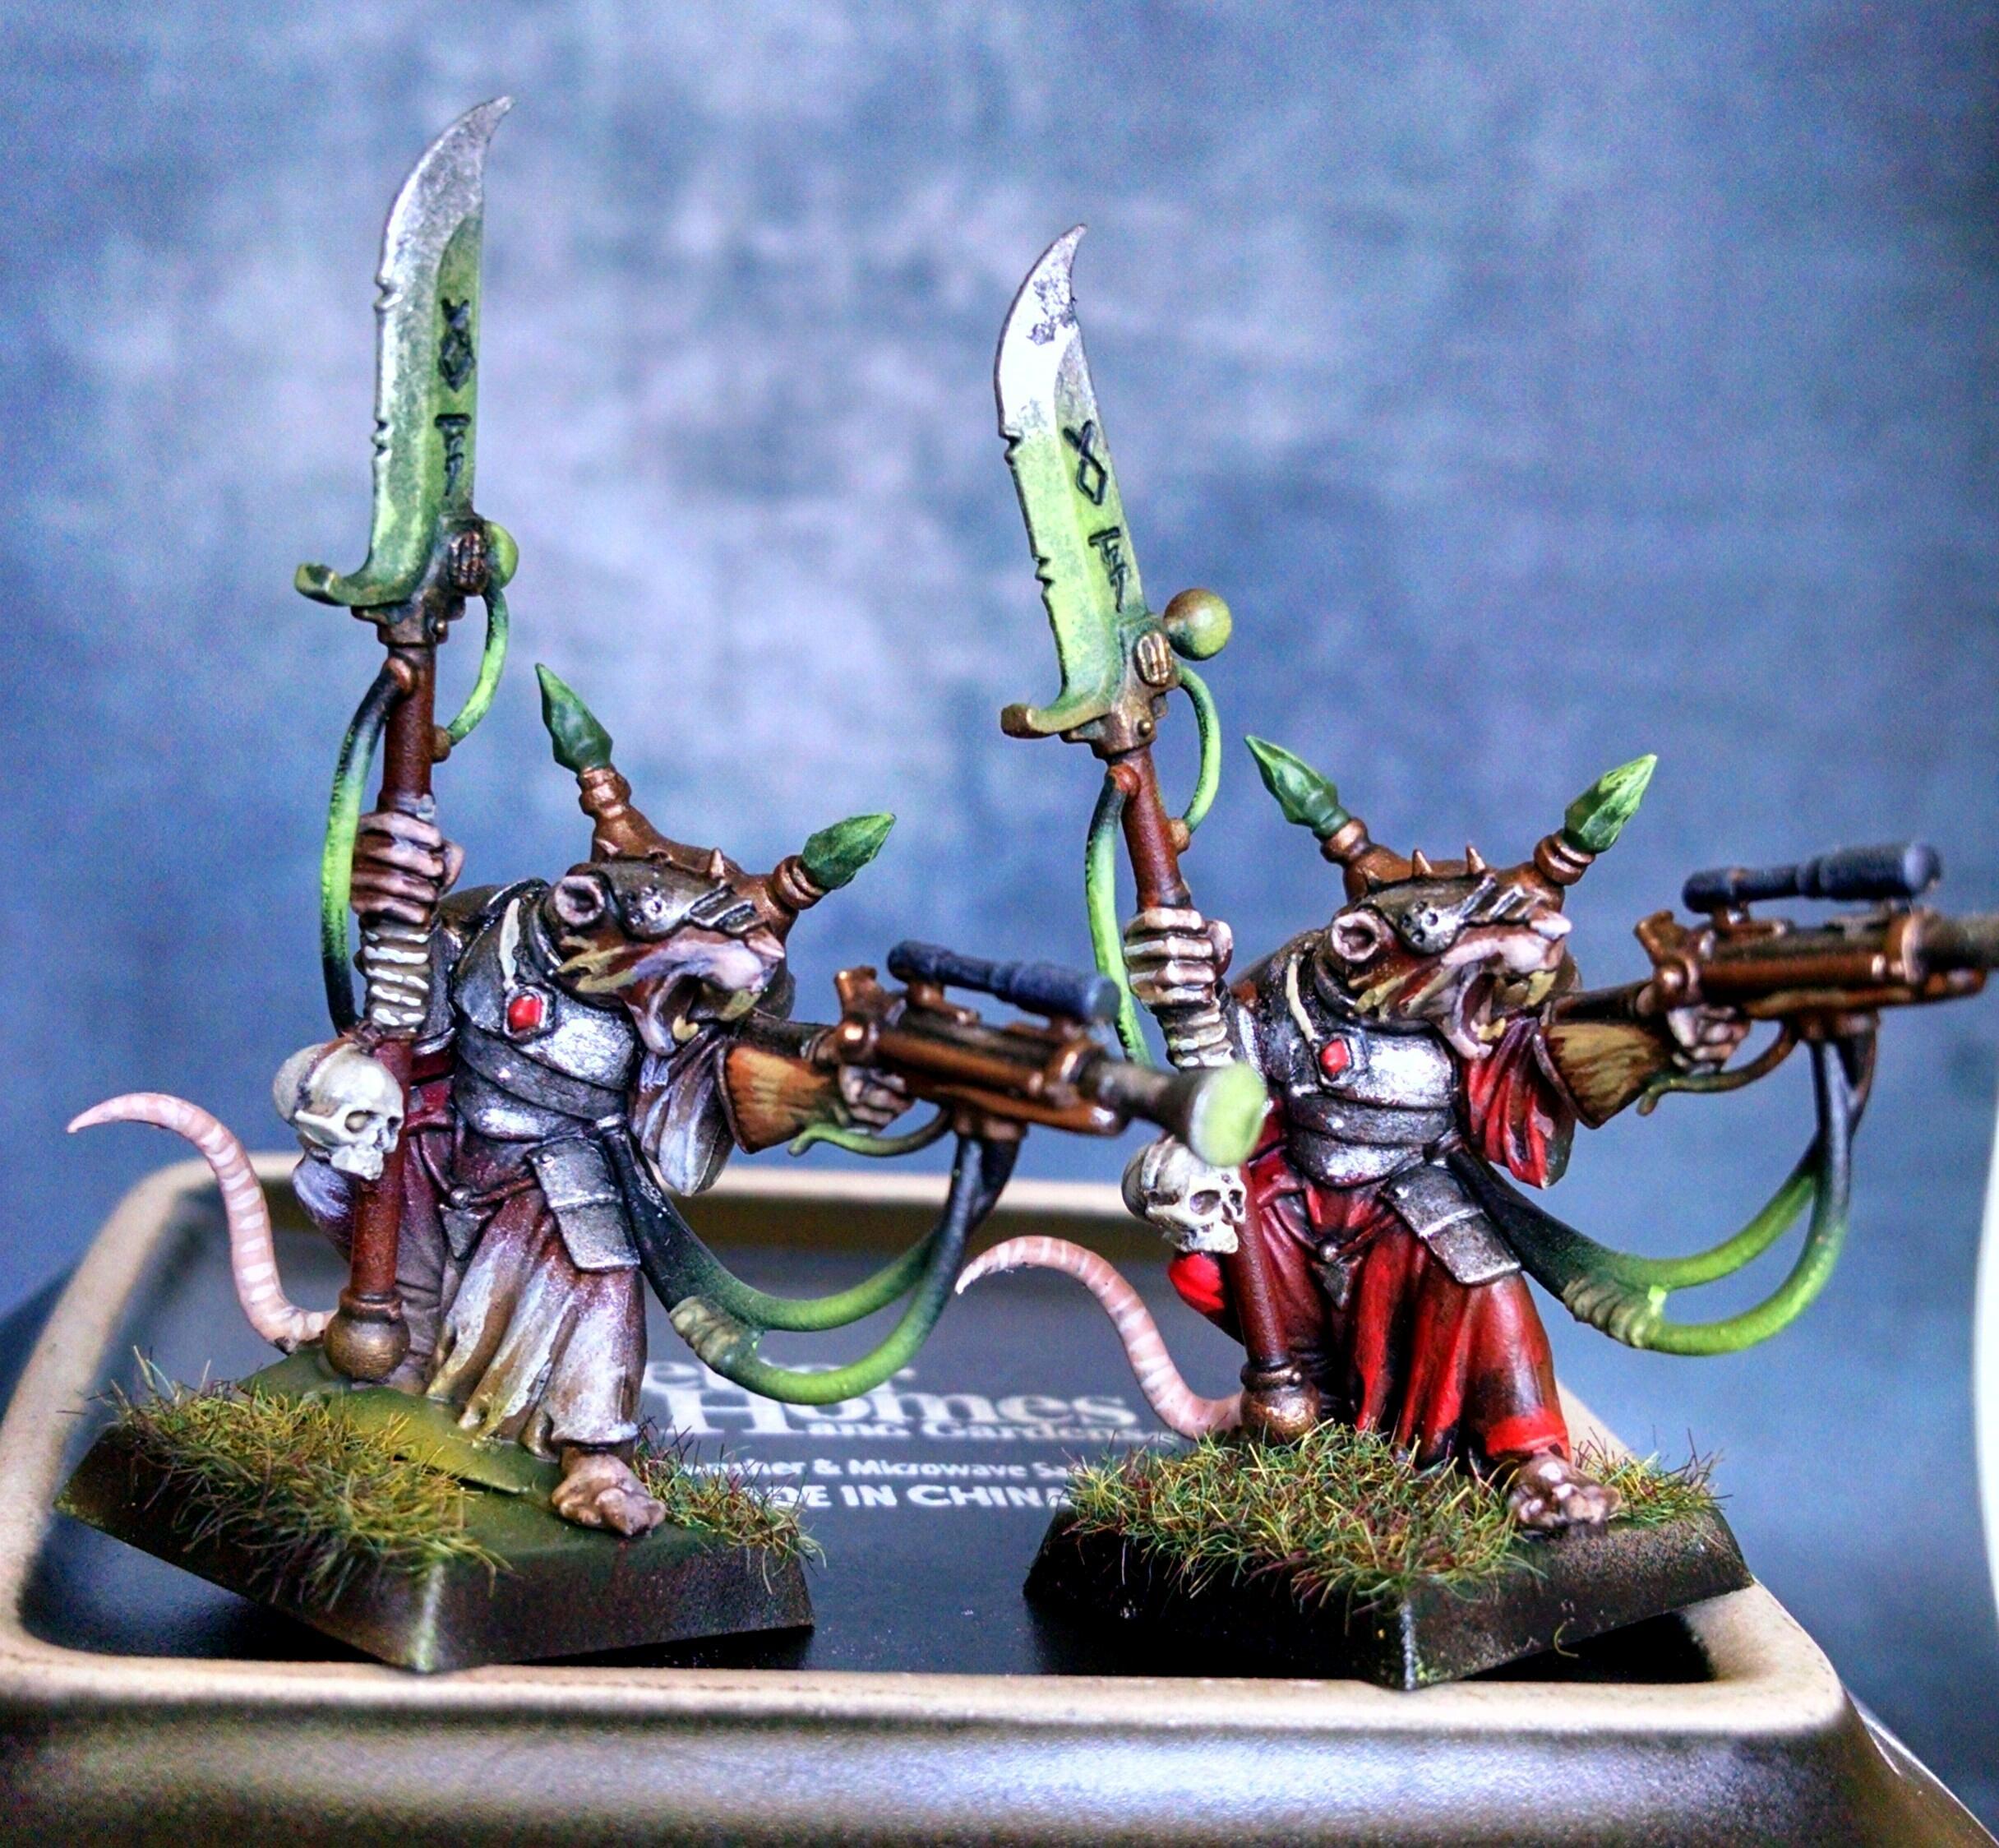 Bonebreaker, Engineer, Herder, Ogres, Rat, Skaven, Warhammer Fantasy, Warlord, Warp